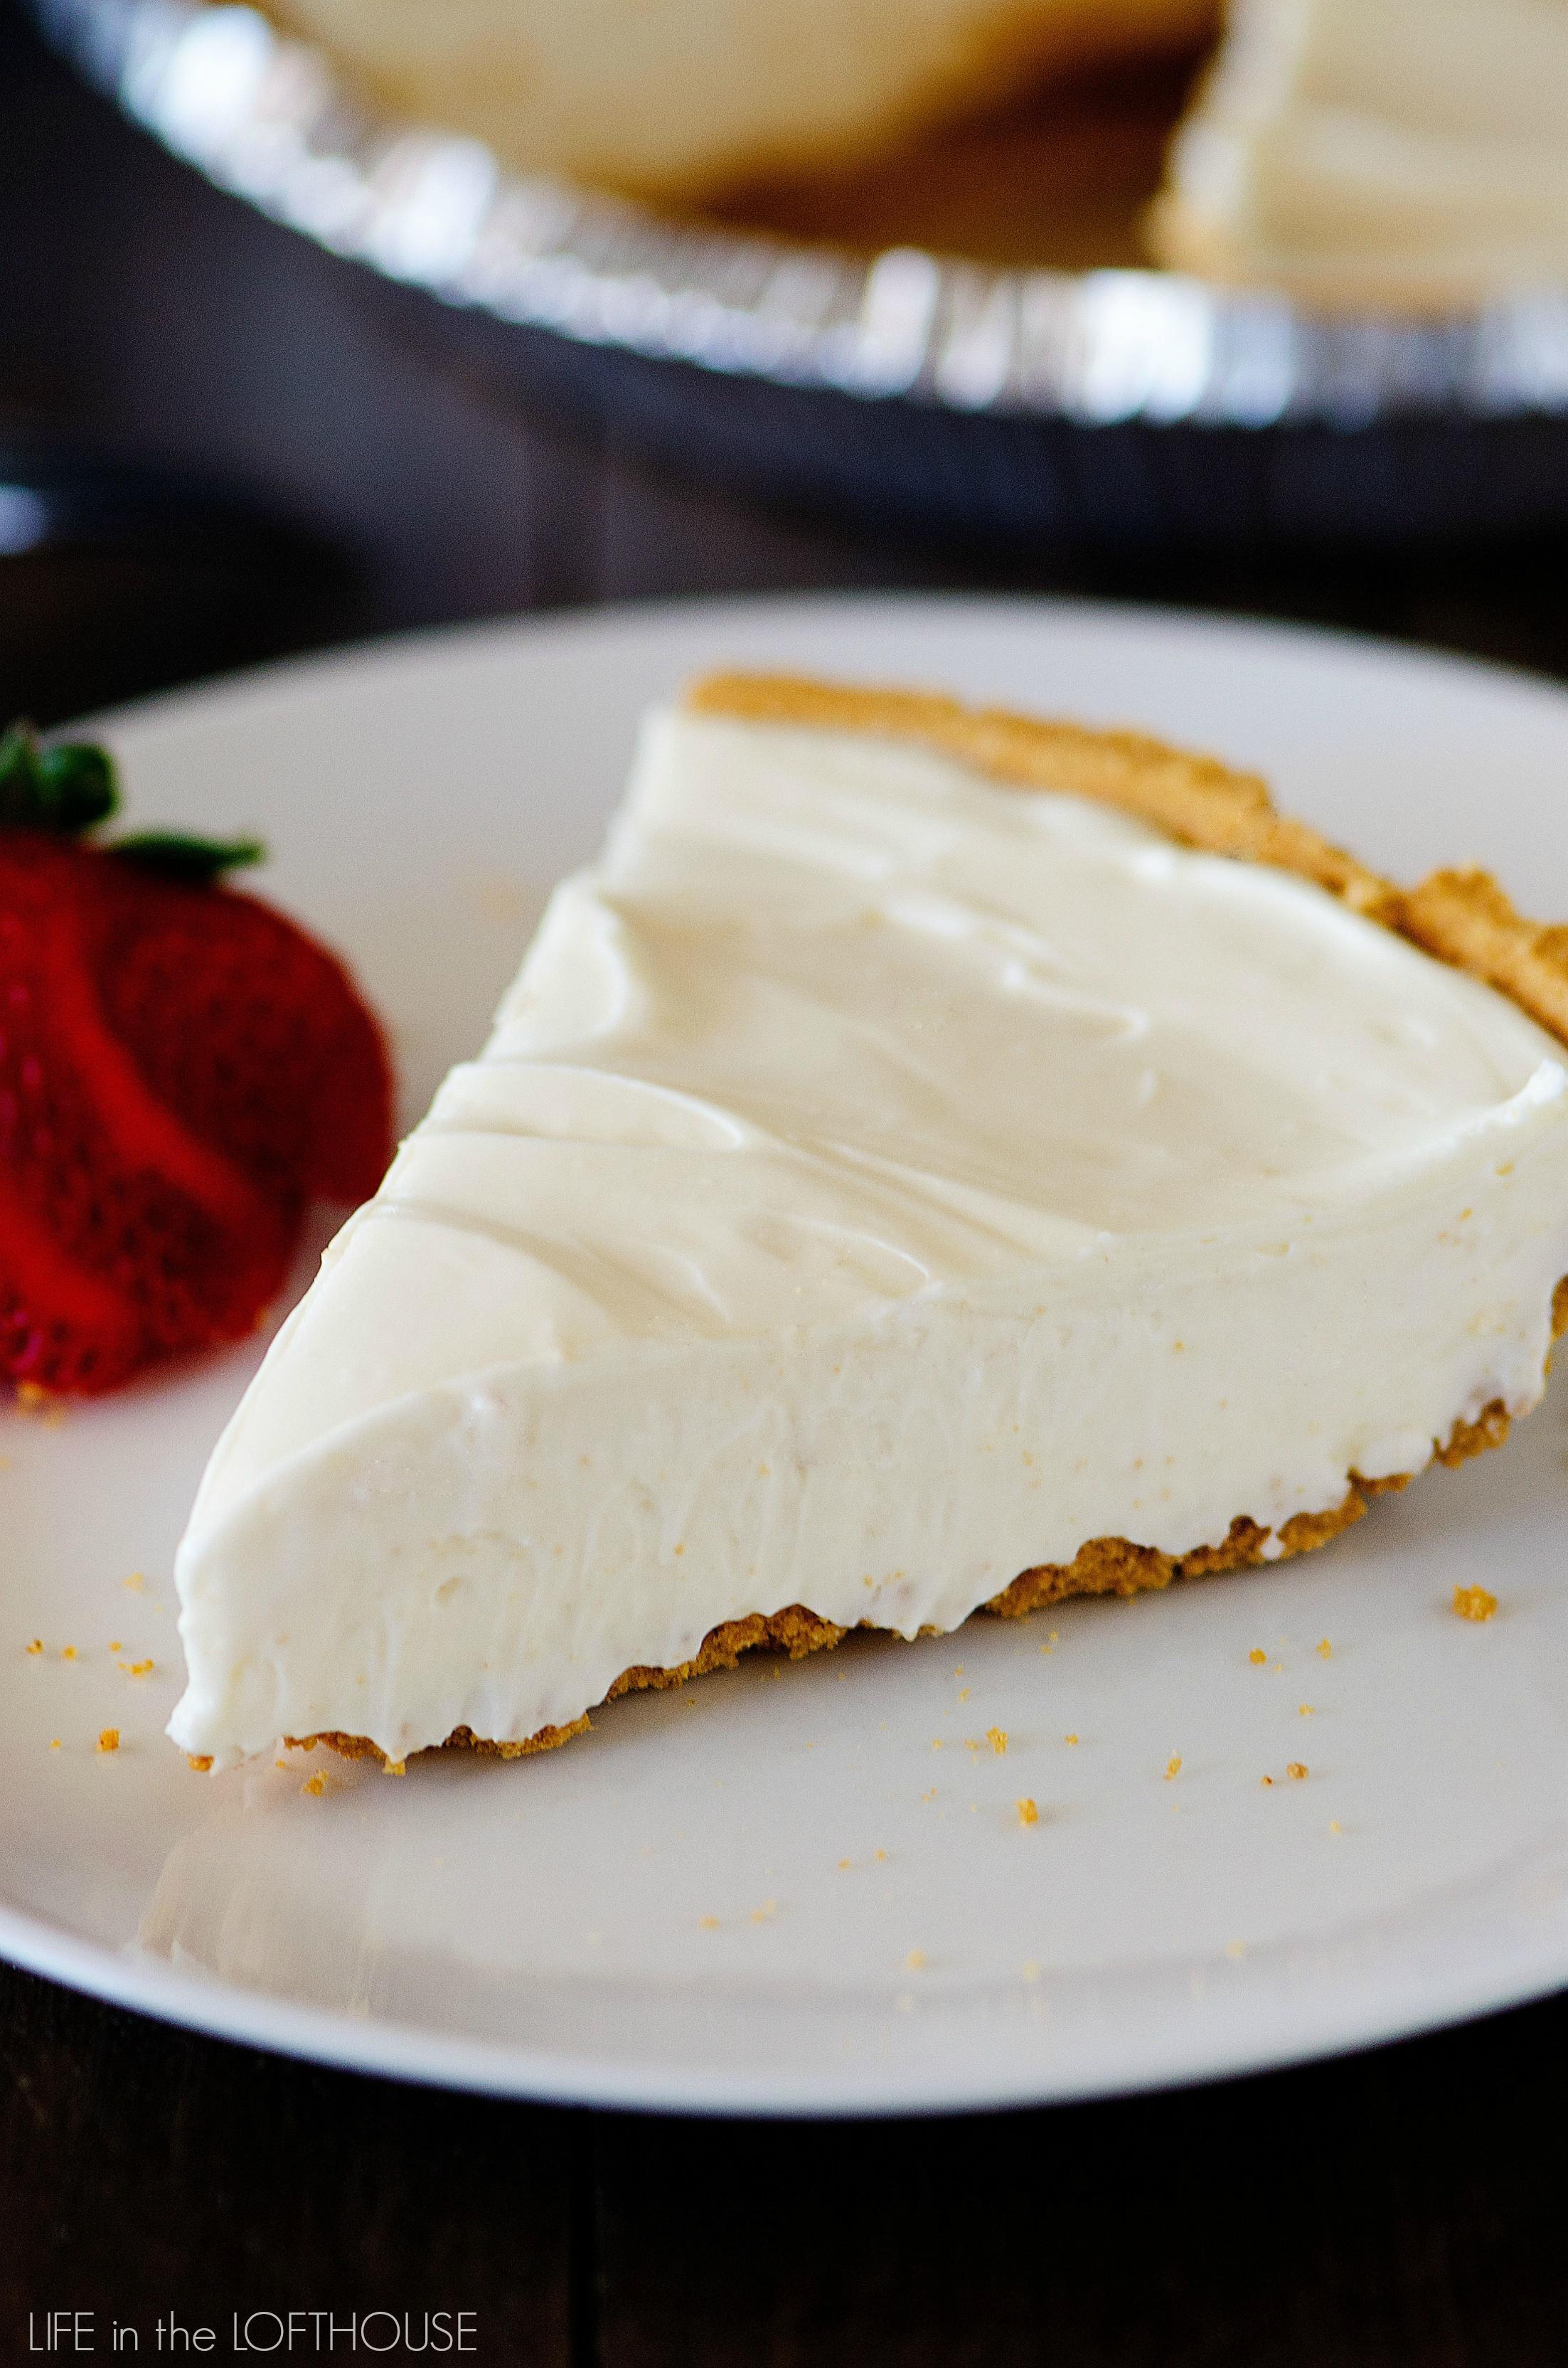 Cheesecake Recipe No Bake  No Bake Cheesecake Life In The Lofthouse